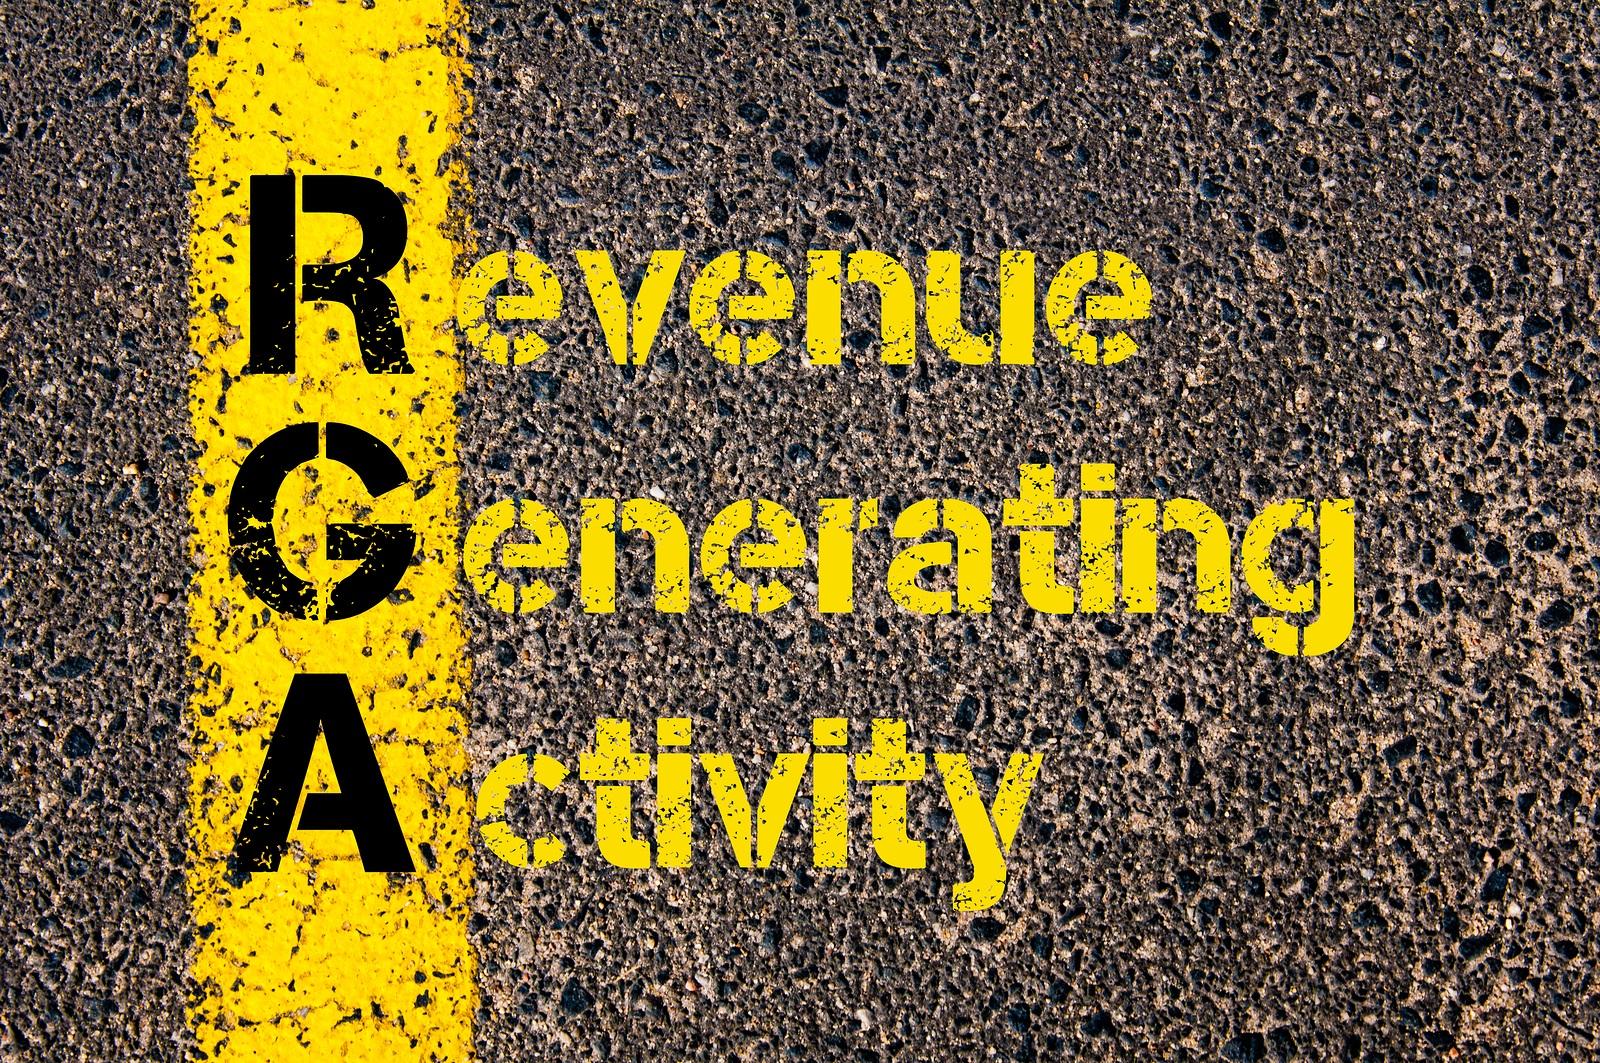 Focus on High Revenue Generating Activities